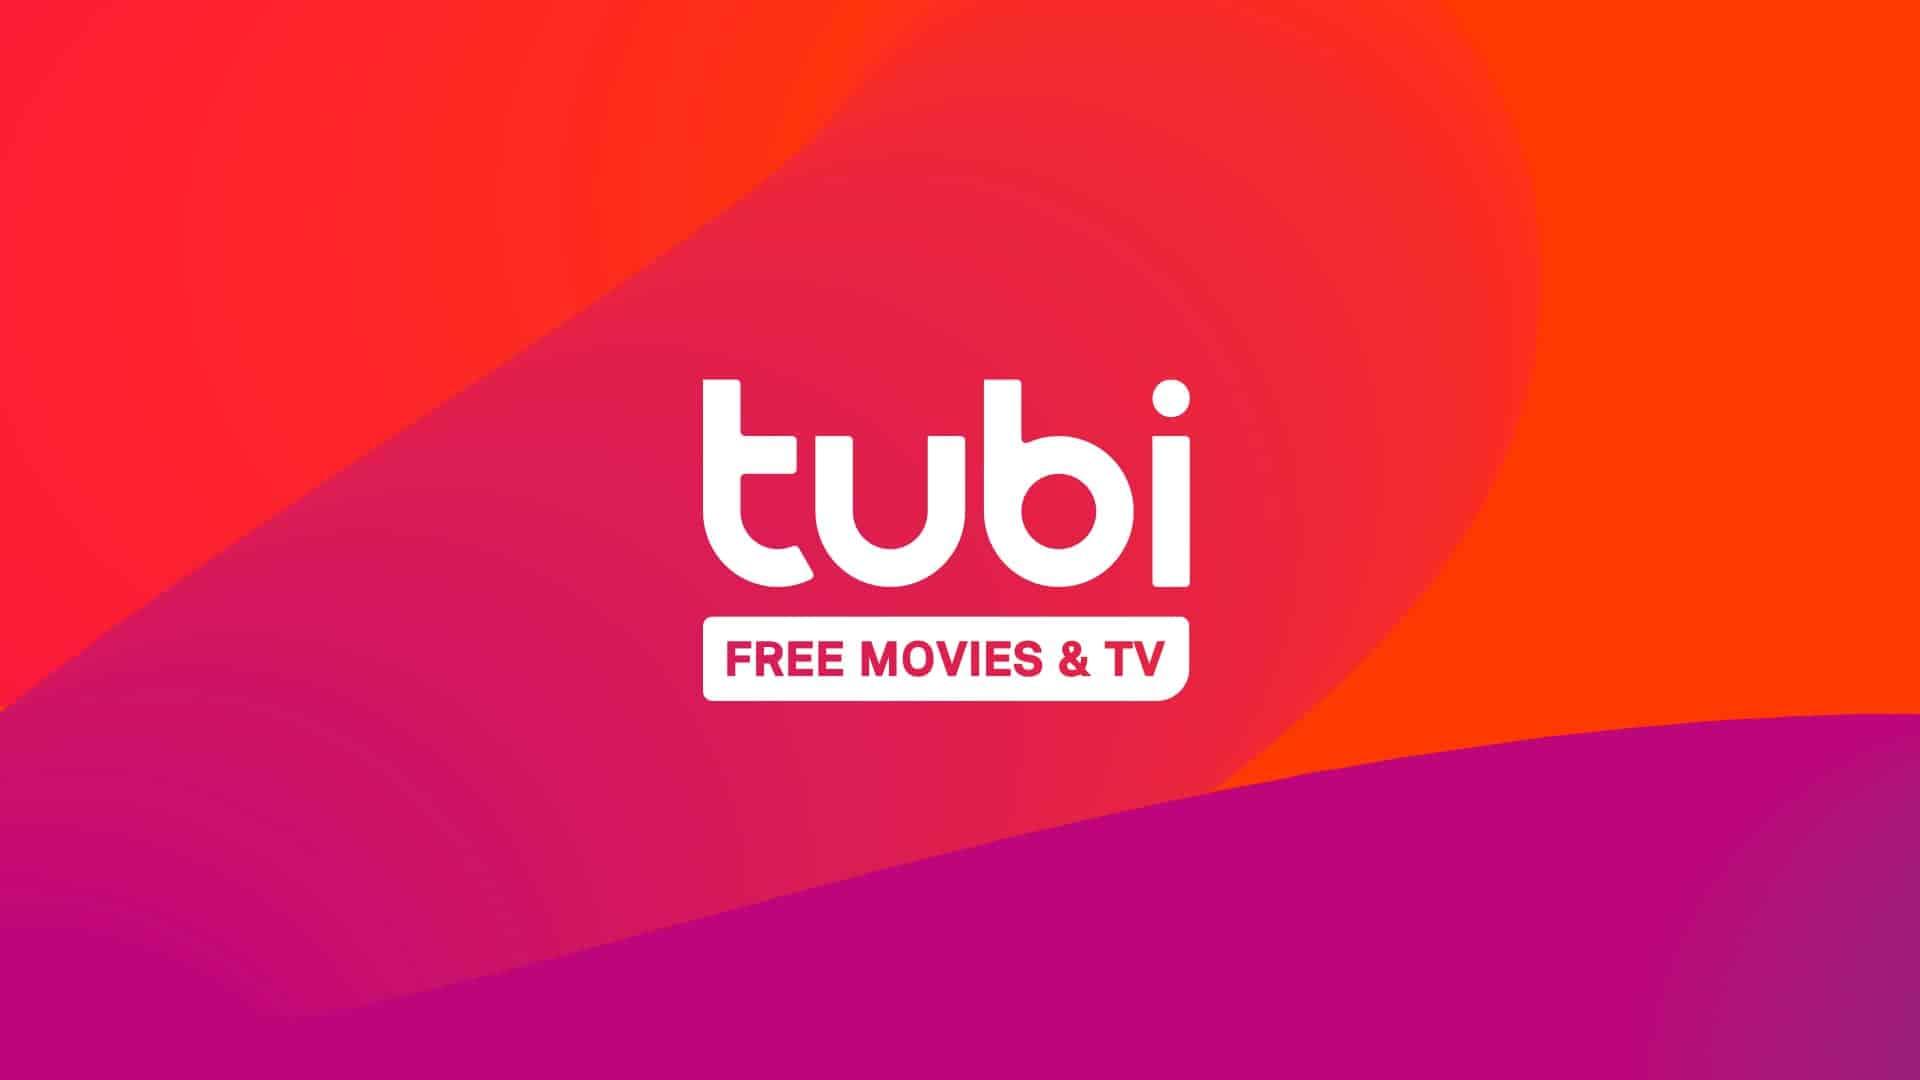 Tubi Free Movies and Tv